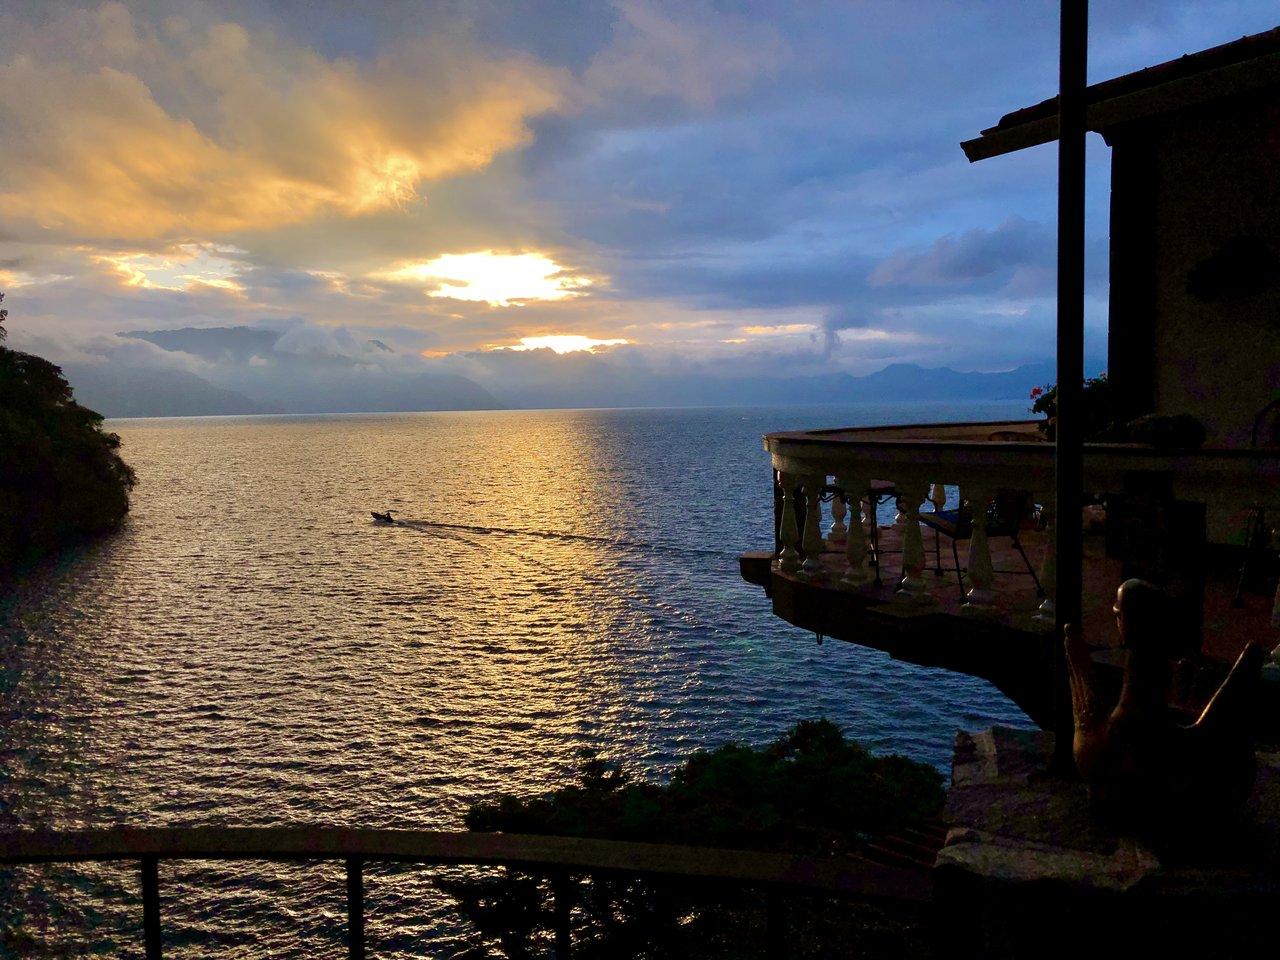 Sunrise on Atitlan | Photo taken by BRAD K